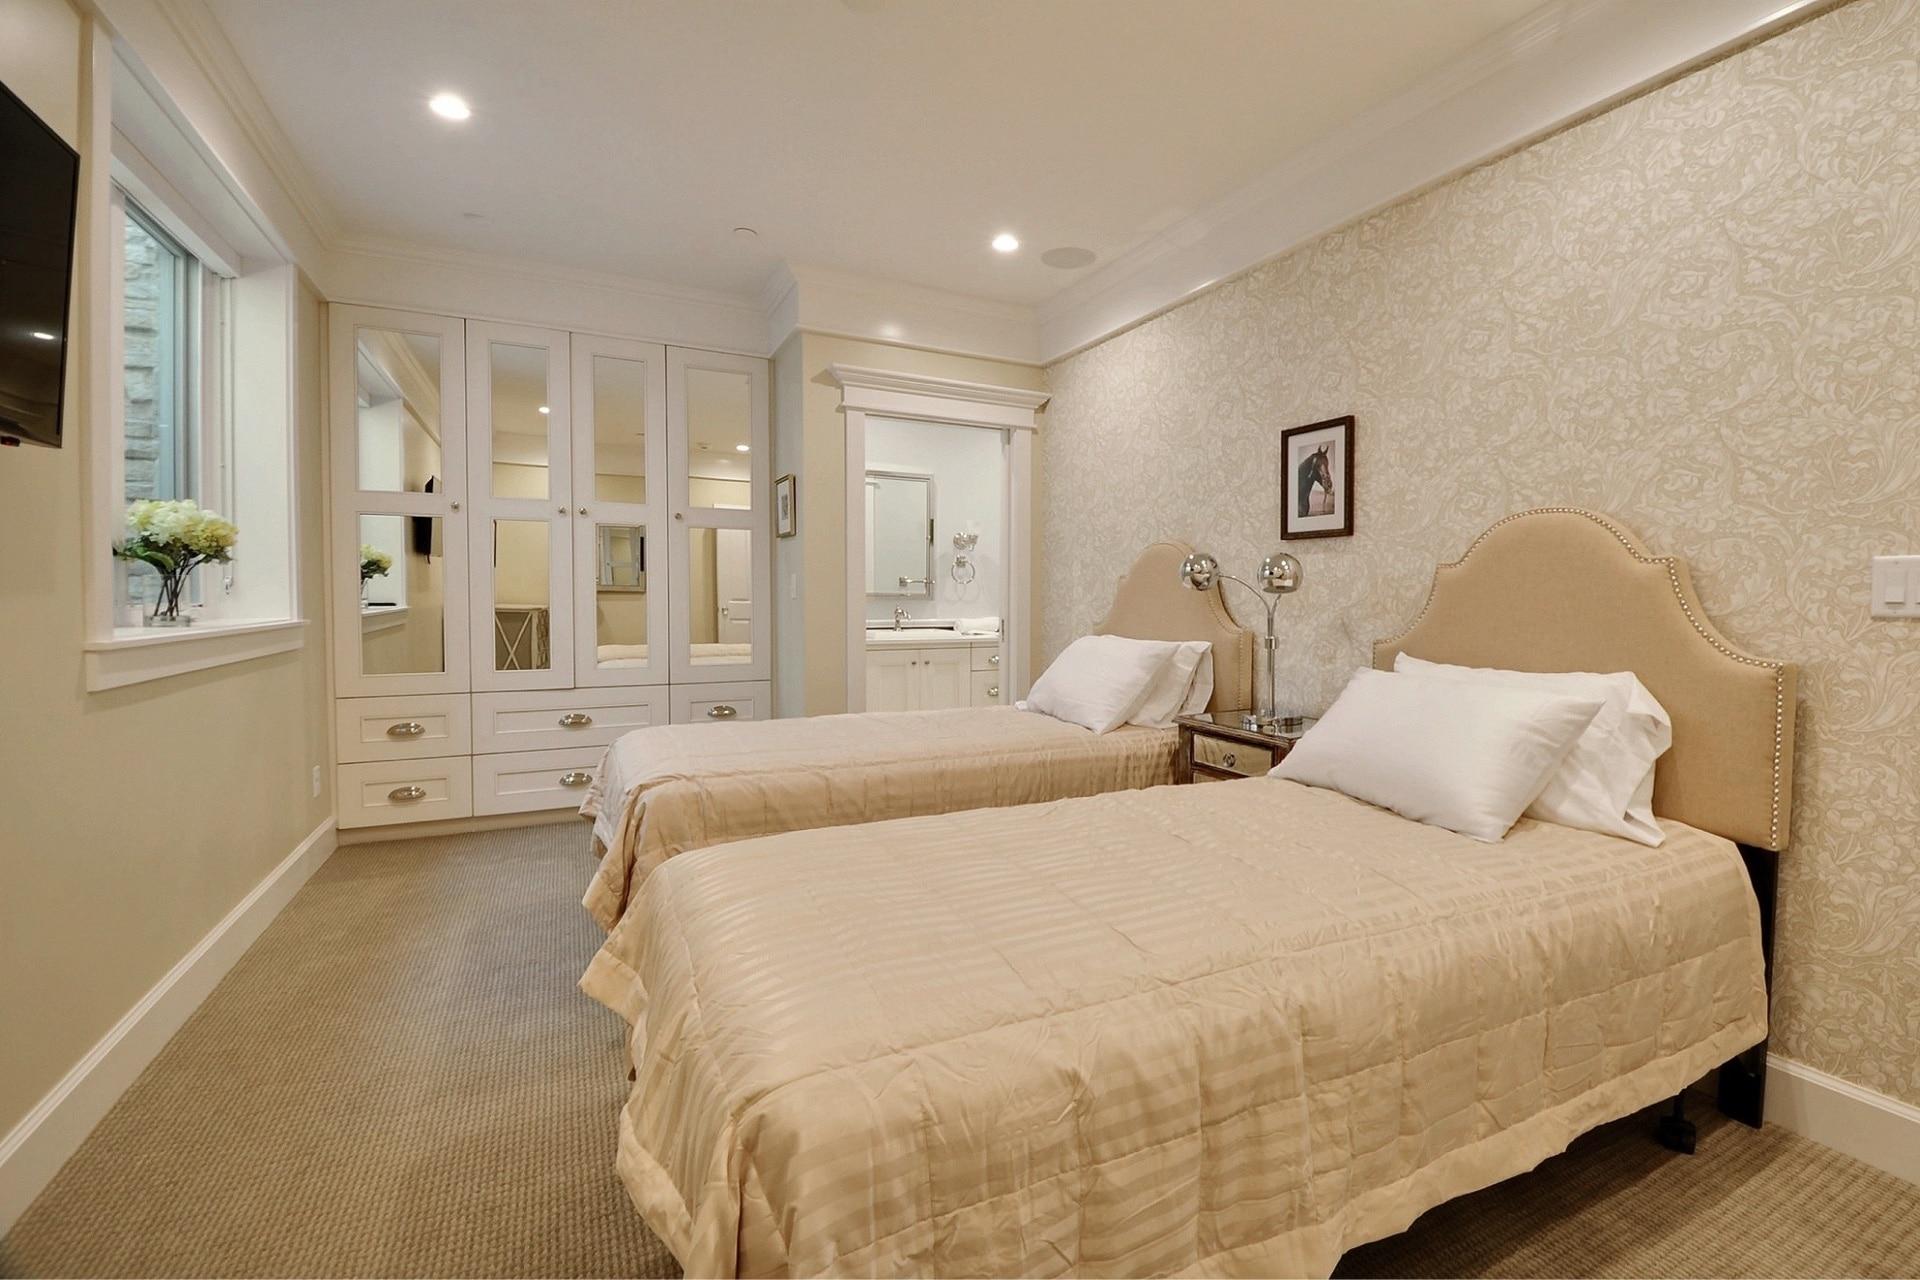 Woodside Avenue, bedroom - architectural design by Elliott Workgroup